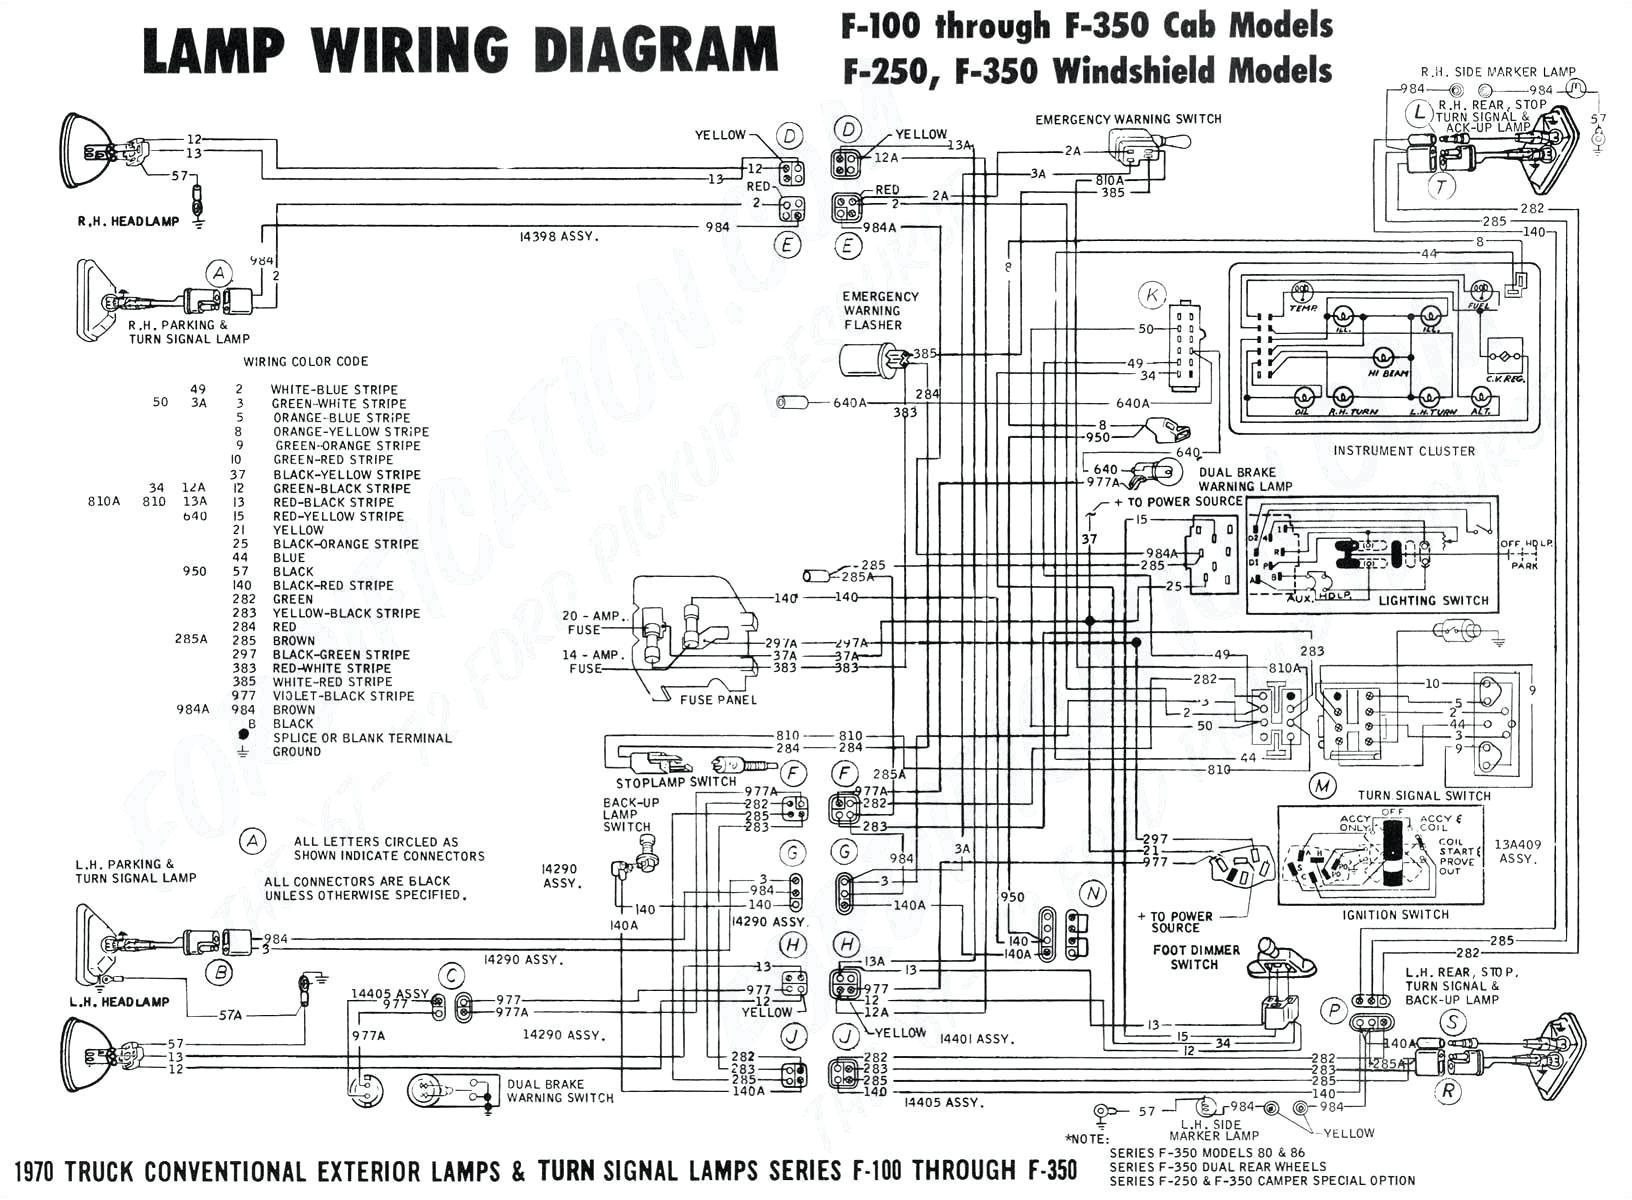 mitsubishi space wagon wiring diagram schematics wiring diagrams u2022 rh parntesis co mitsubishi mini split system